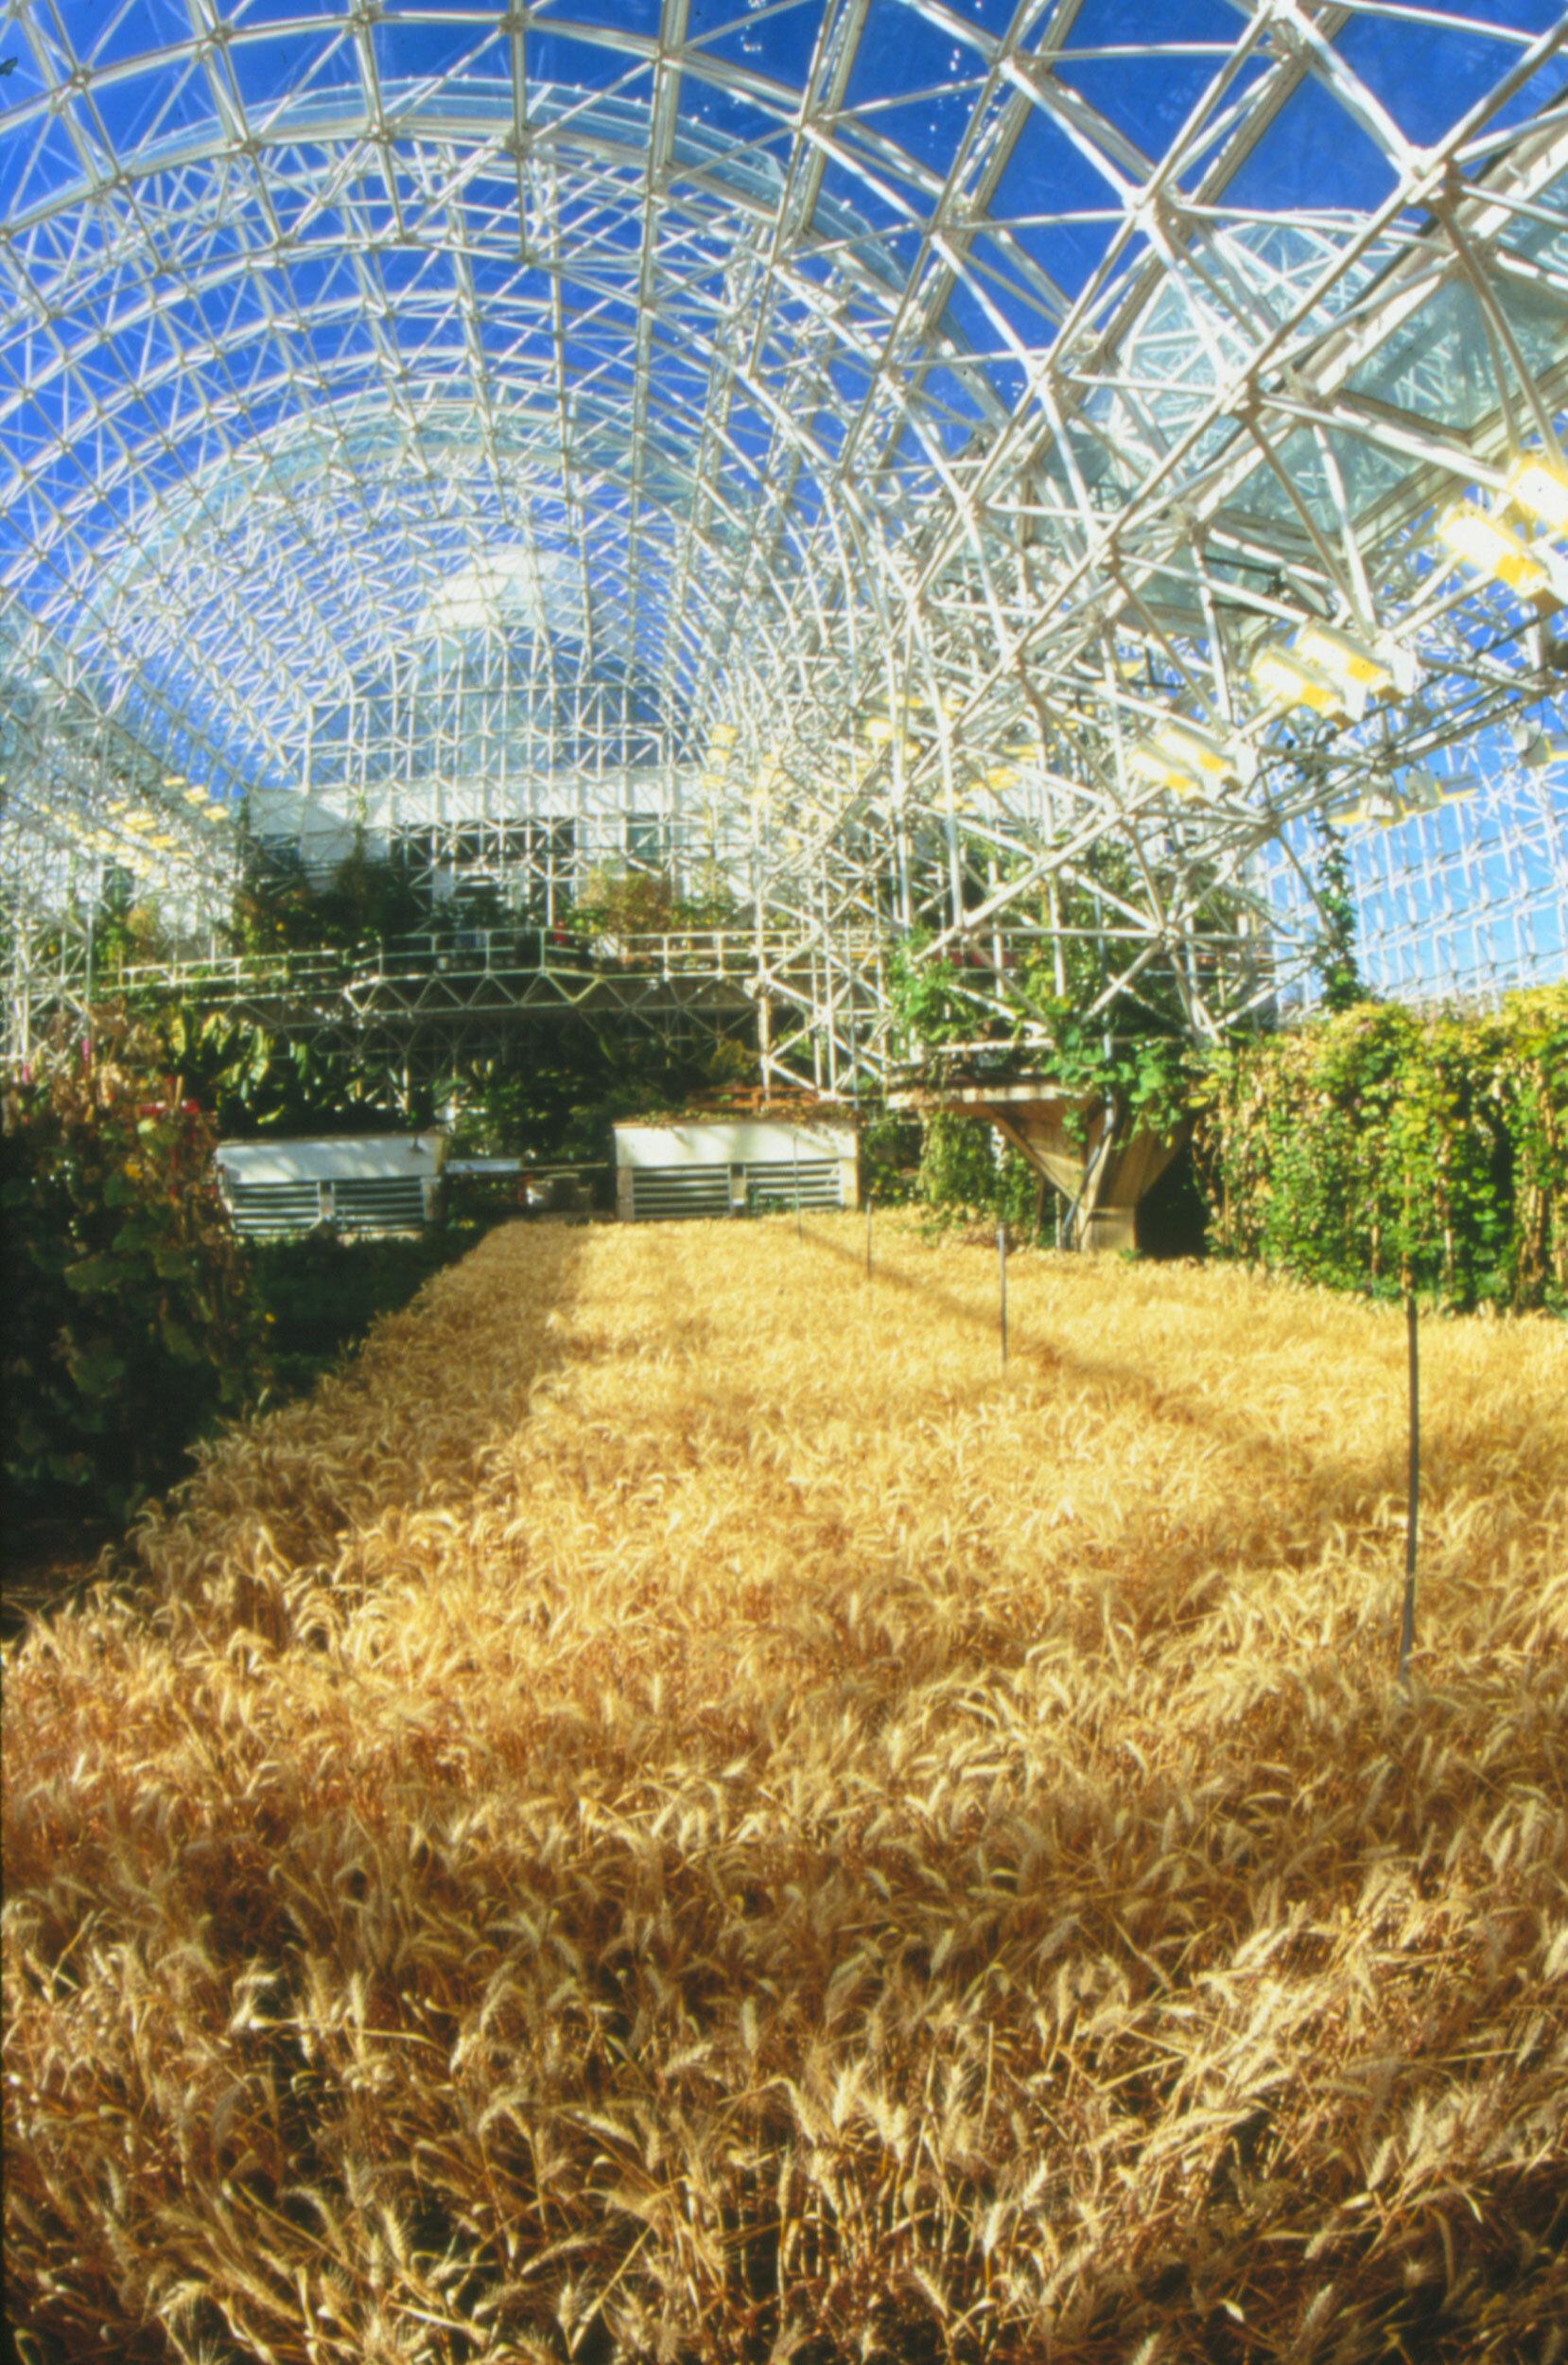 Fields of wheat in the Biosphere 2